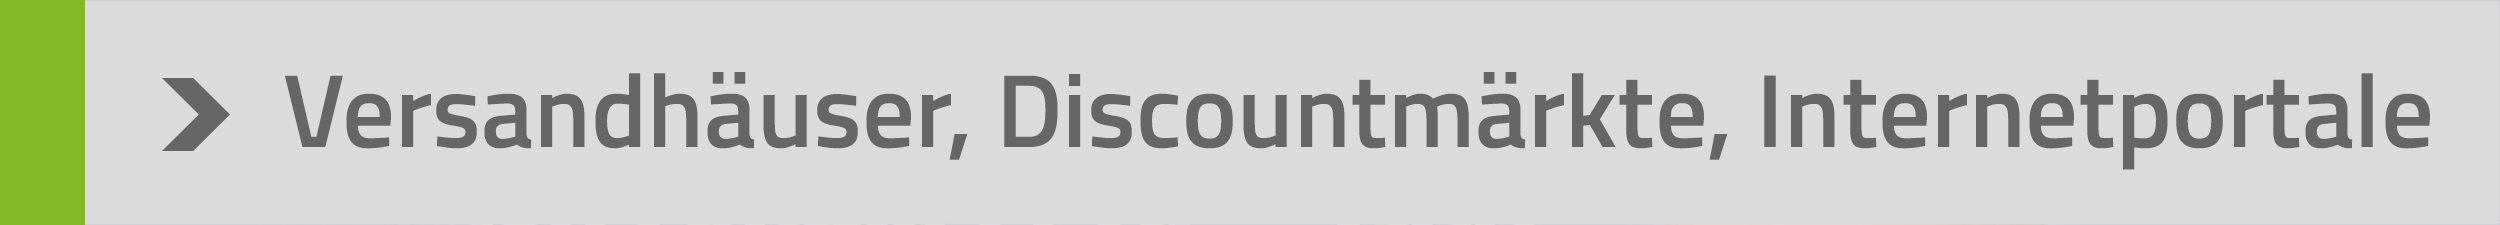 Versandhäuser, Discountmärkte und Internetportale